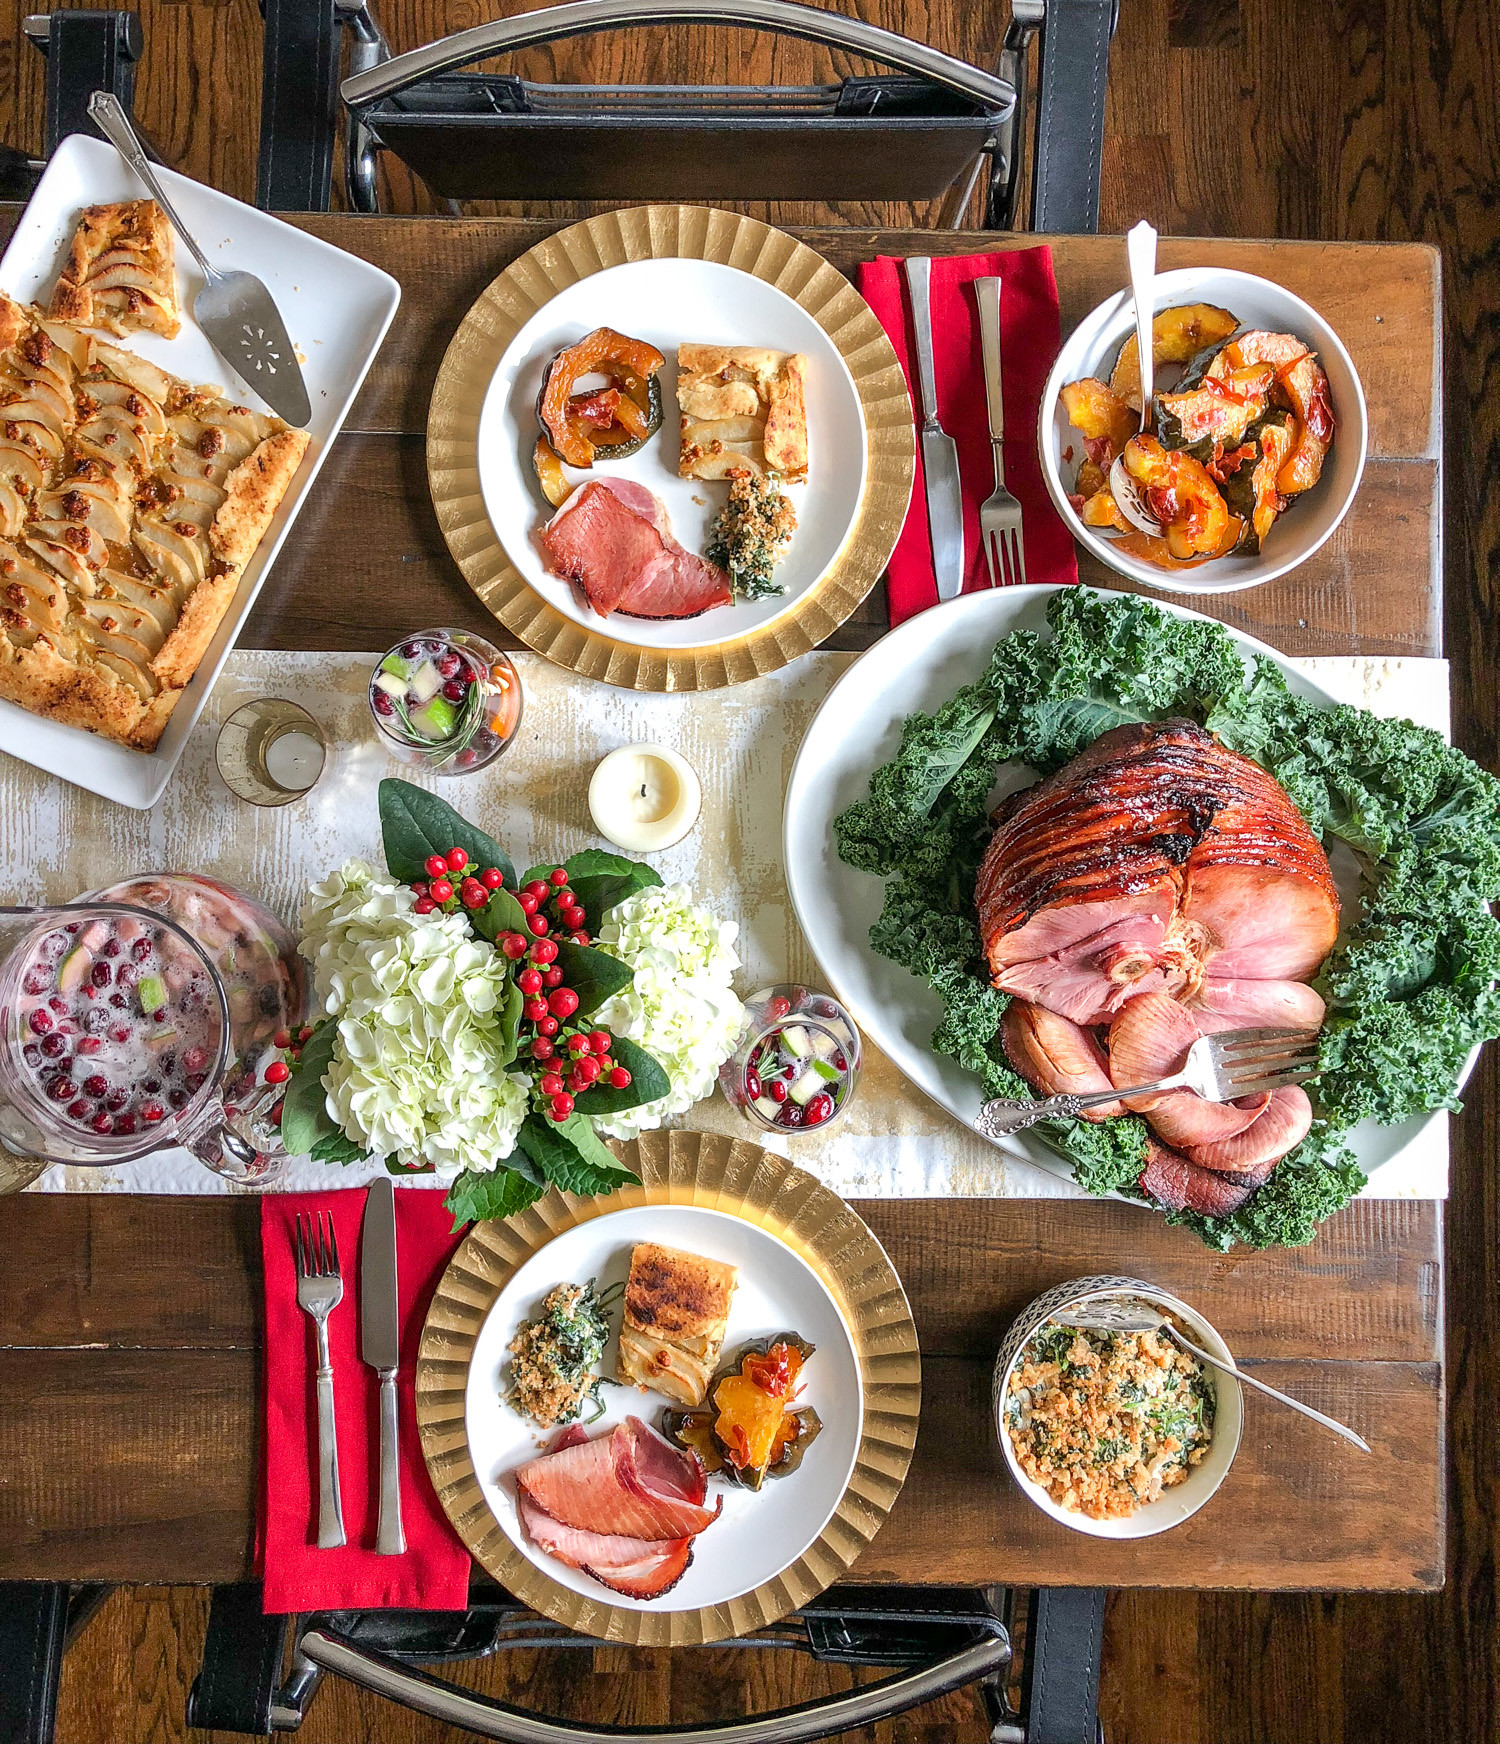 Christmas Ham Dinners  Christmas Dinner Menu Ideas Plan a Memorable Meal for